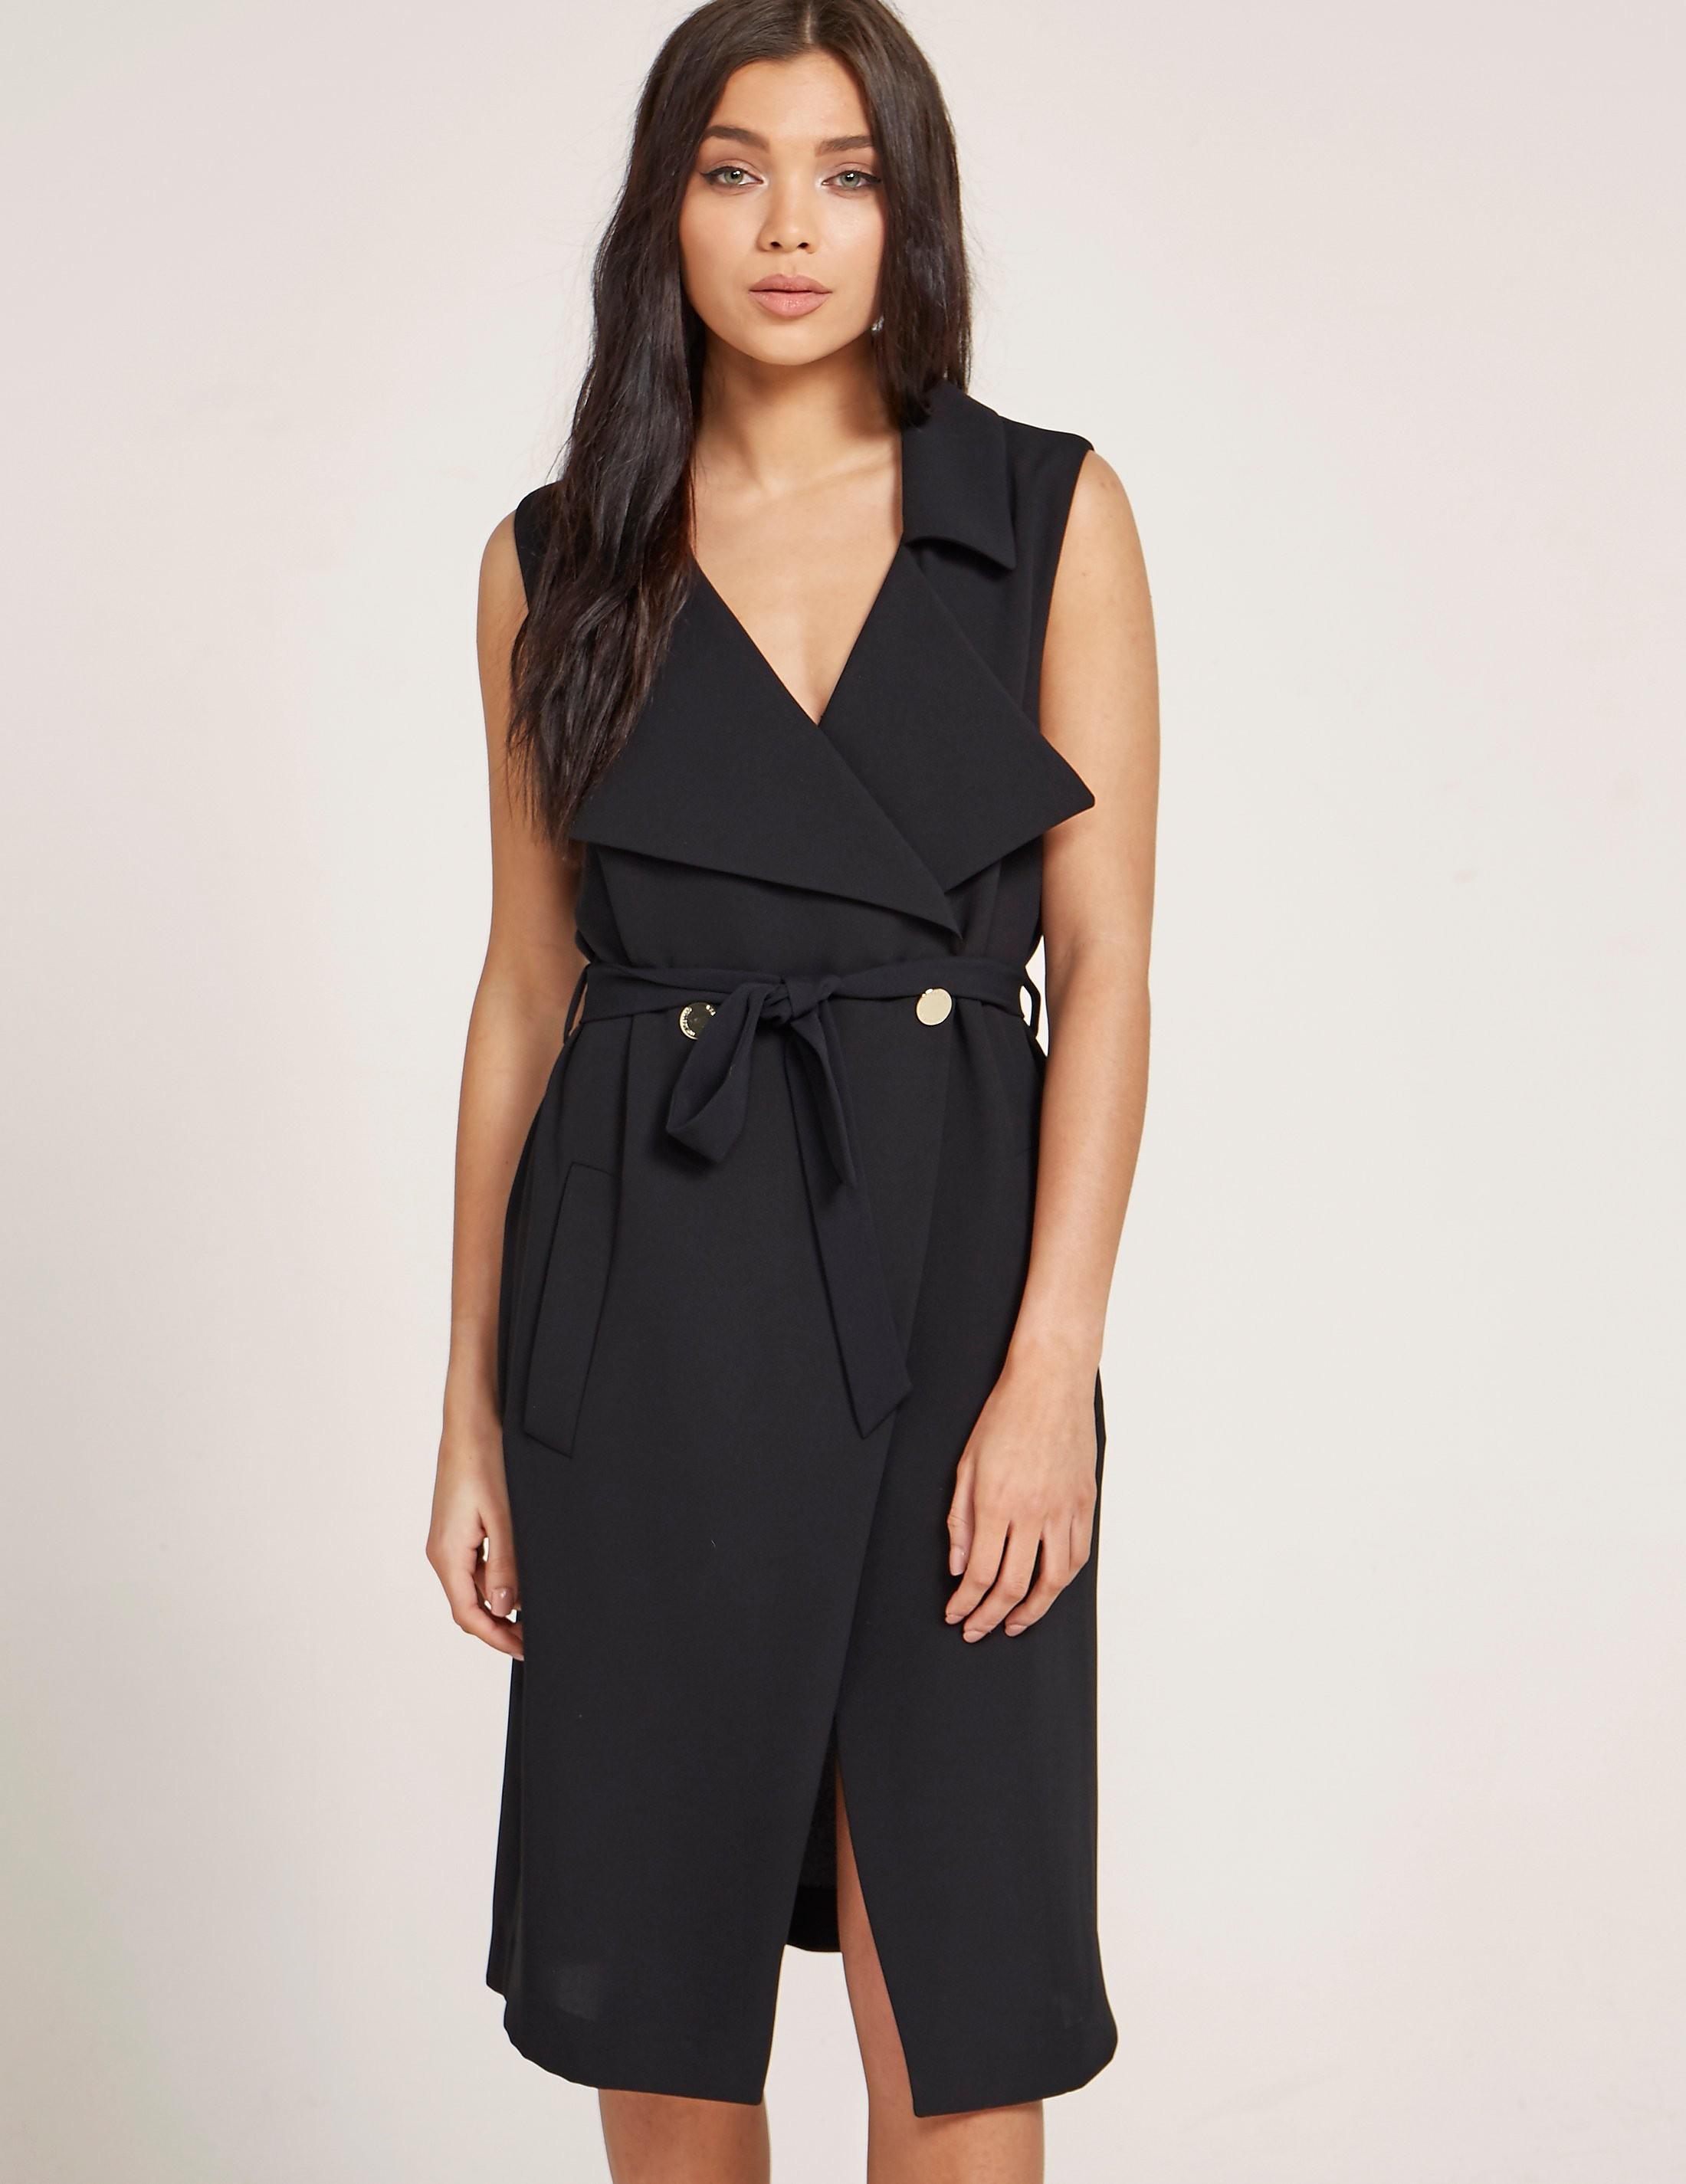 Versus Versace Blouson Black Tie Dress